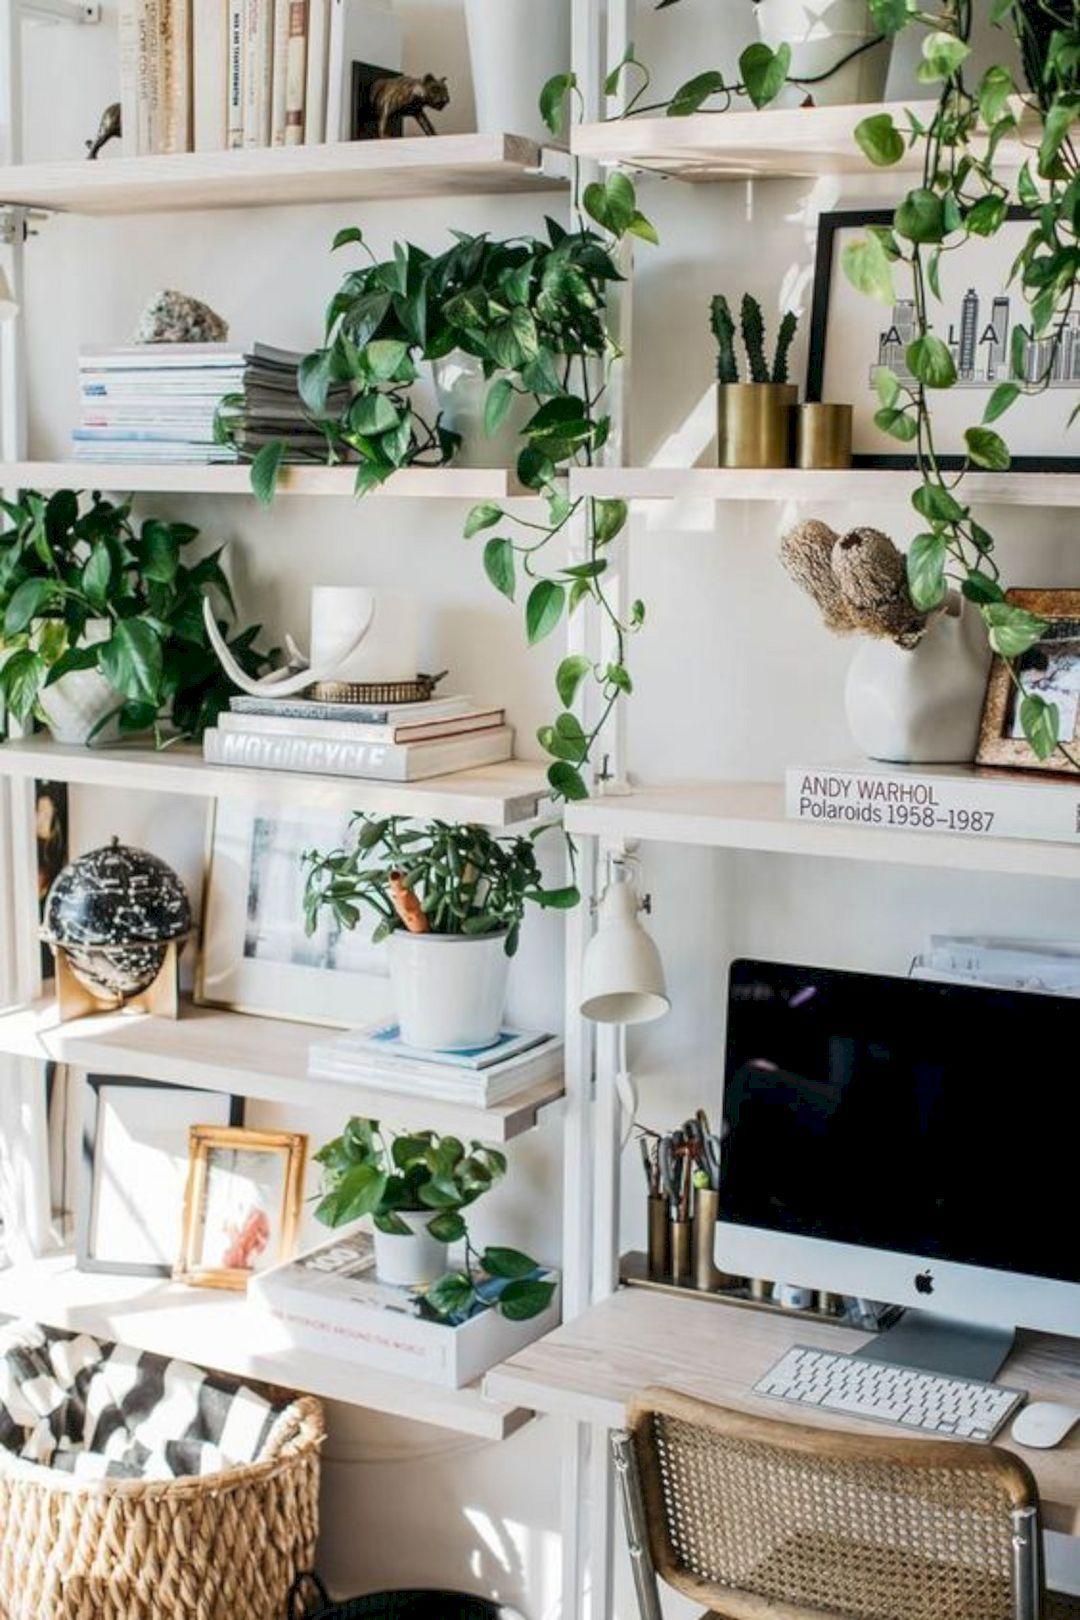 19 Unique Home Decor Ideas With Plants Brilliant Diy Ideas Home